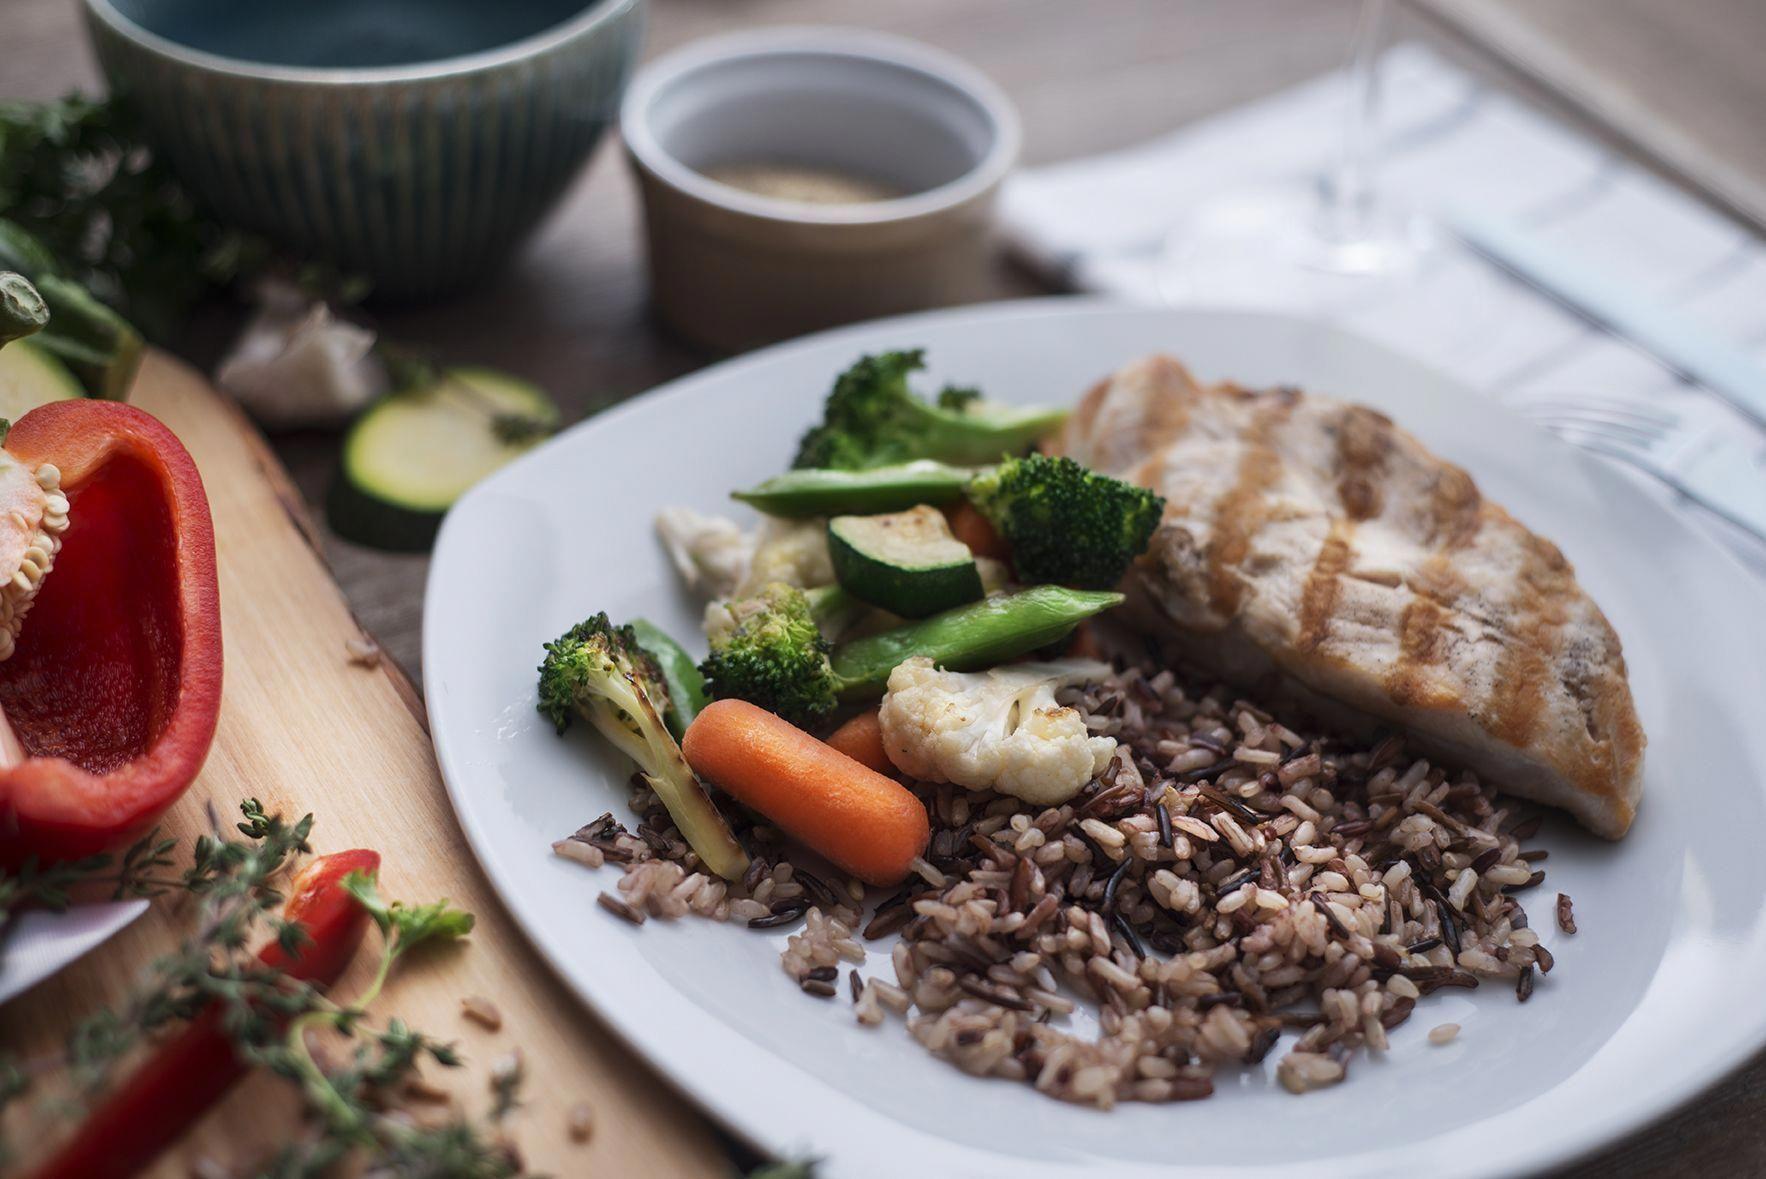 Beef terrine and pork tenderloin with calvados Recipe